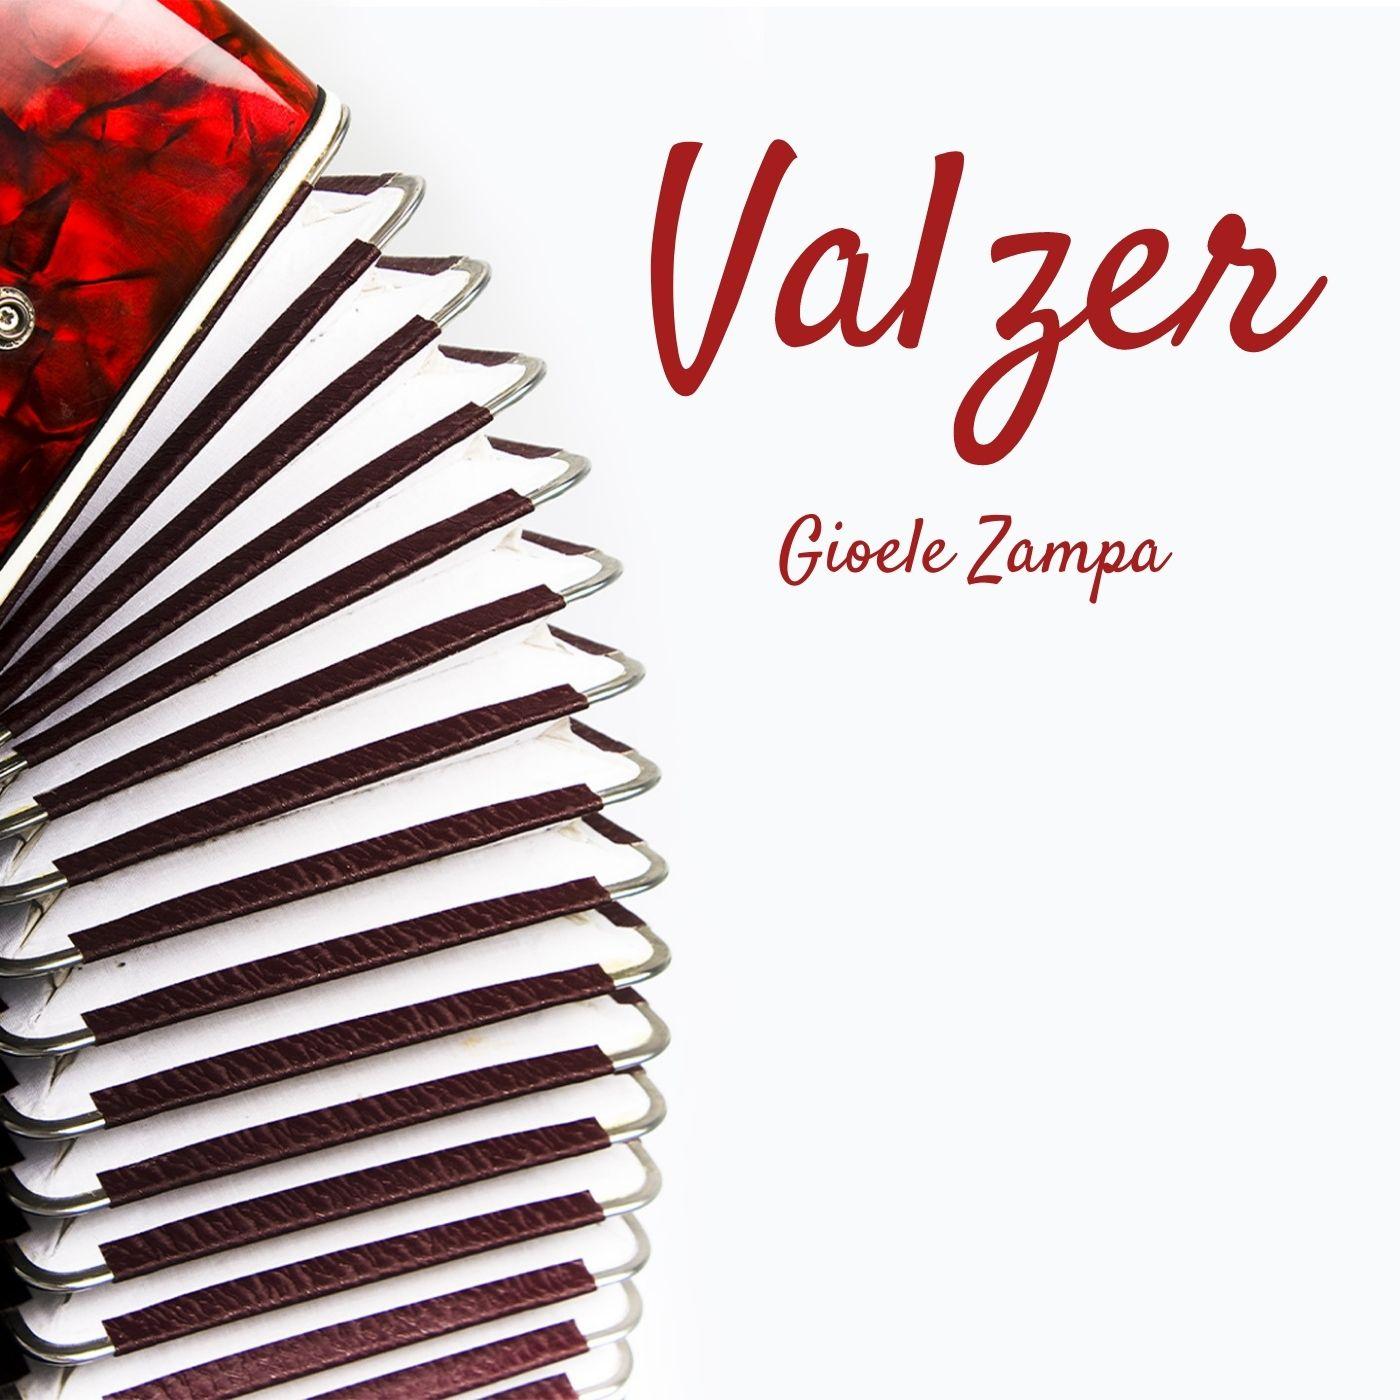 Ancora Valzer!